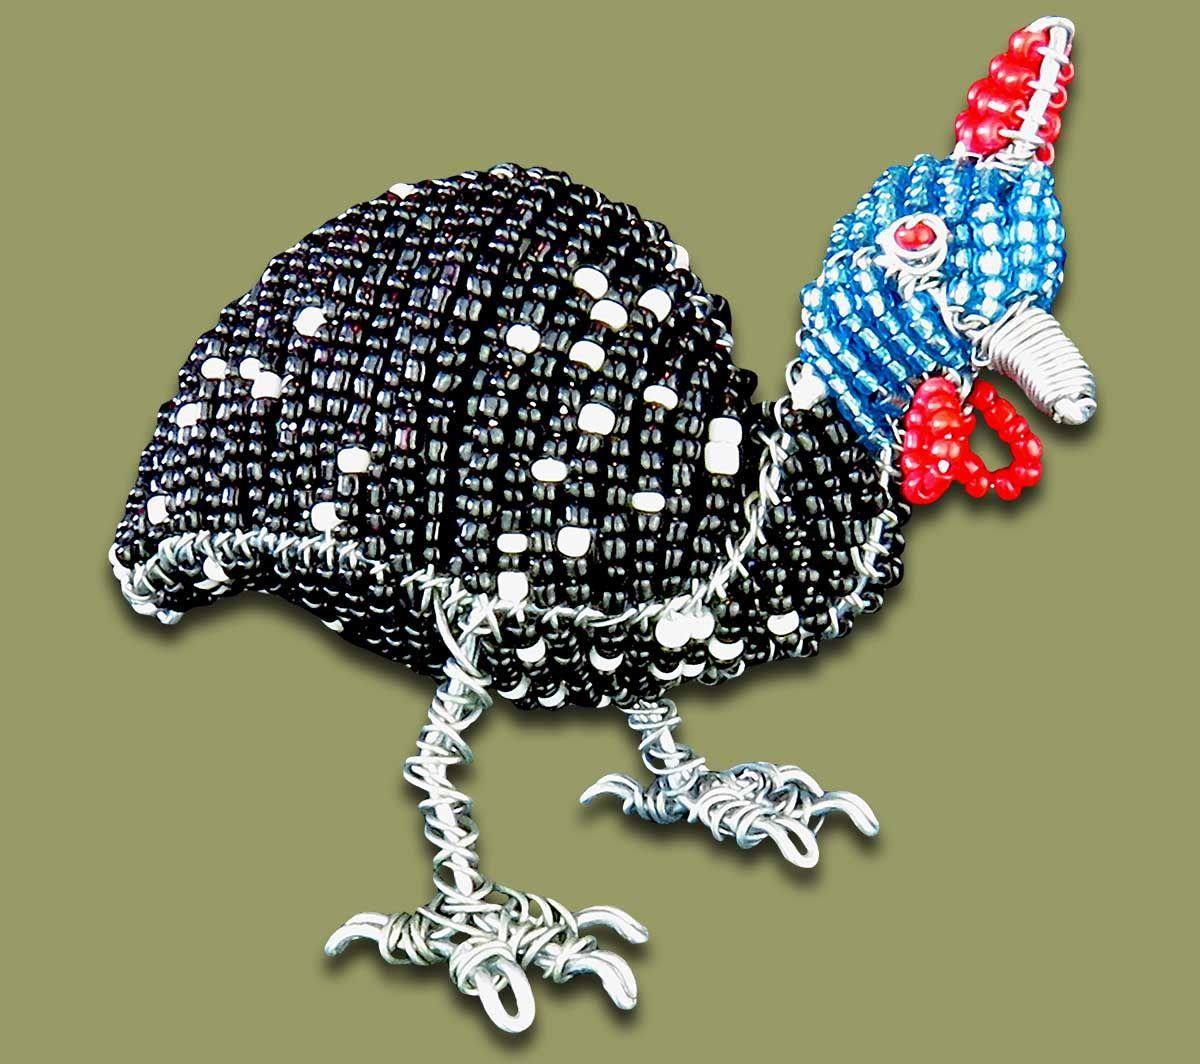 Large Guinea Fowl Beaded | ༺✿༻Beadwork༺✿༻ | Pinterest | Guinea ...